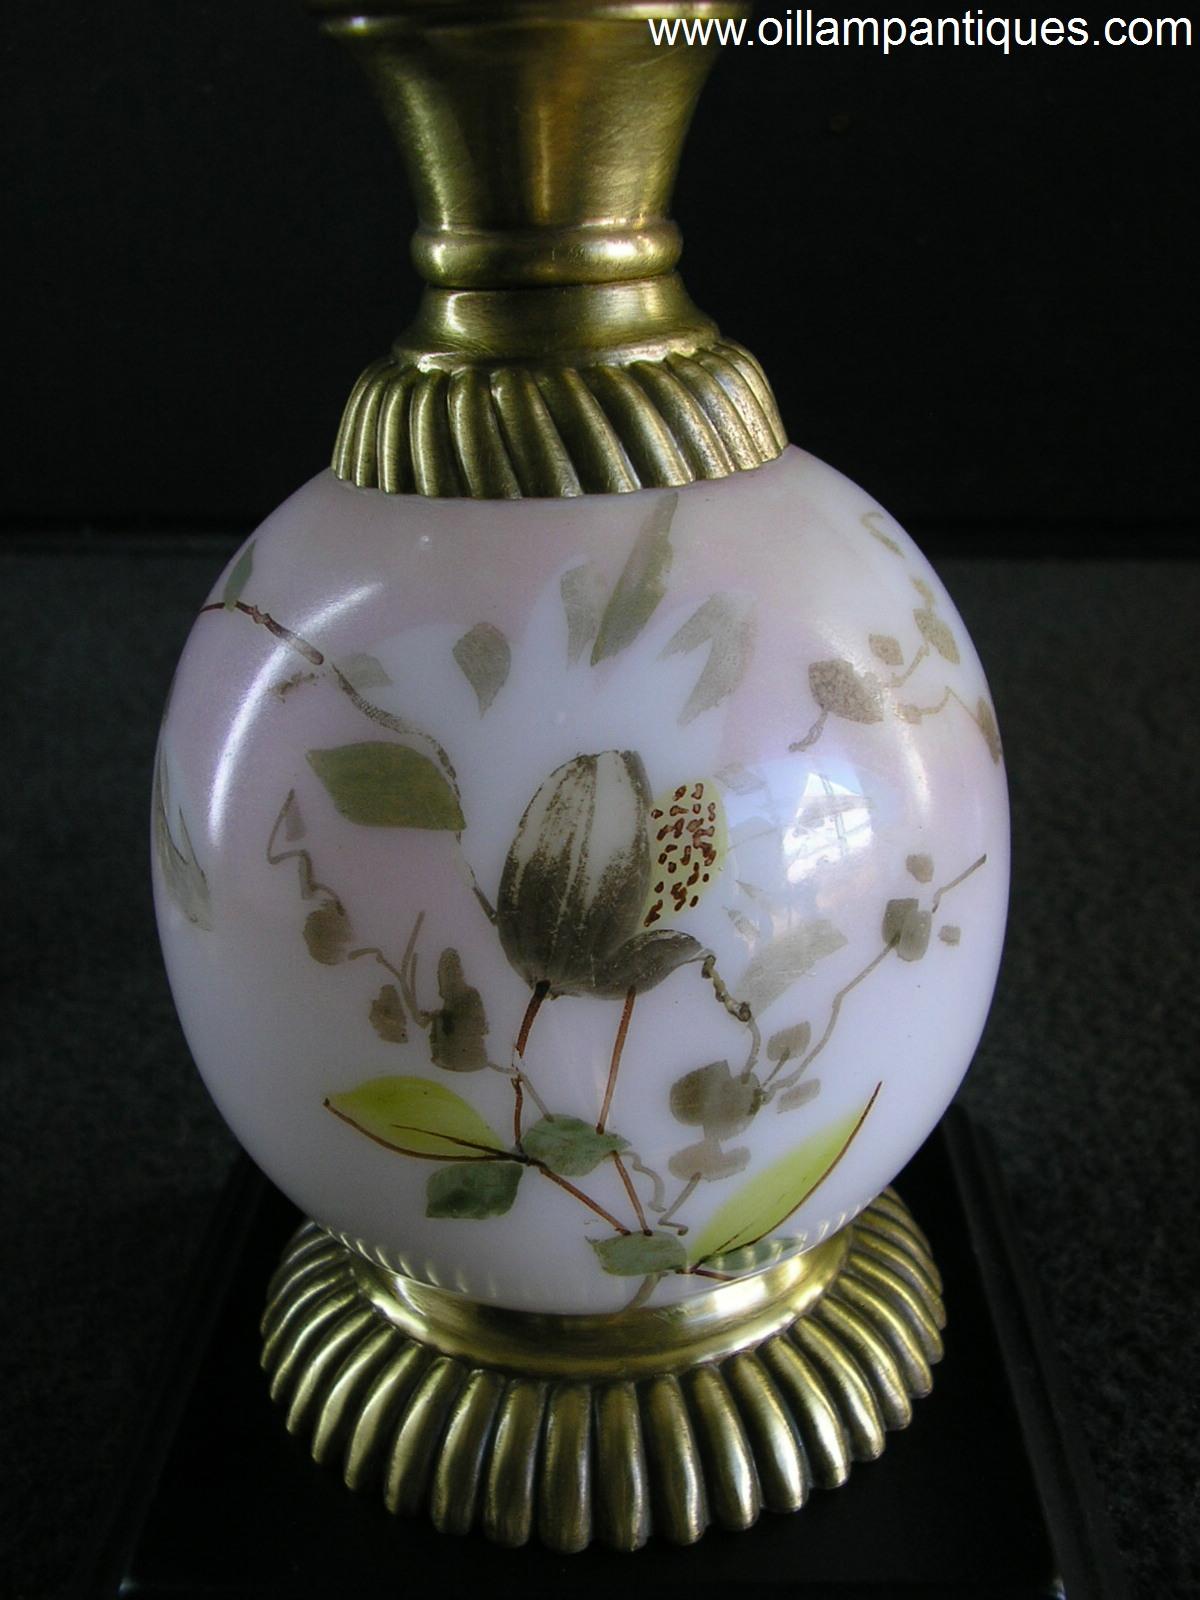 Sears Oil Lamp Circa 1897 Oil Lamp Antiques